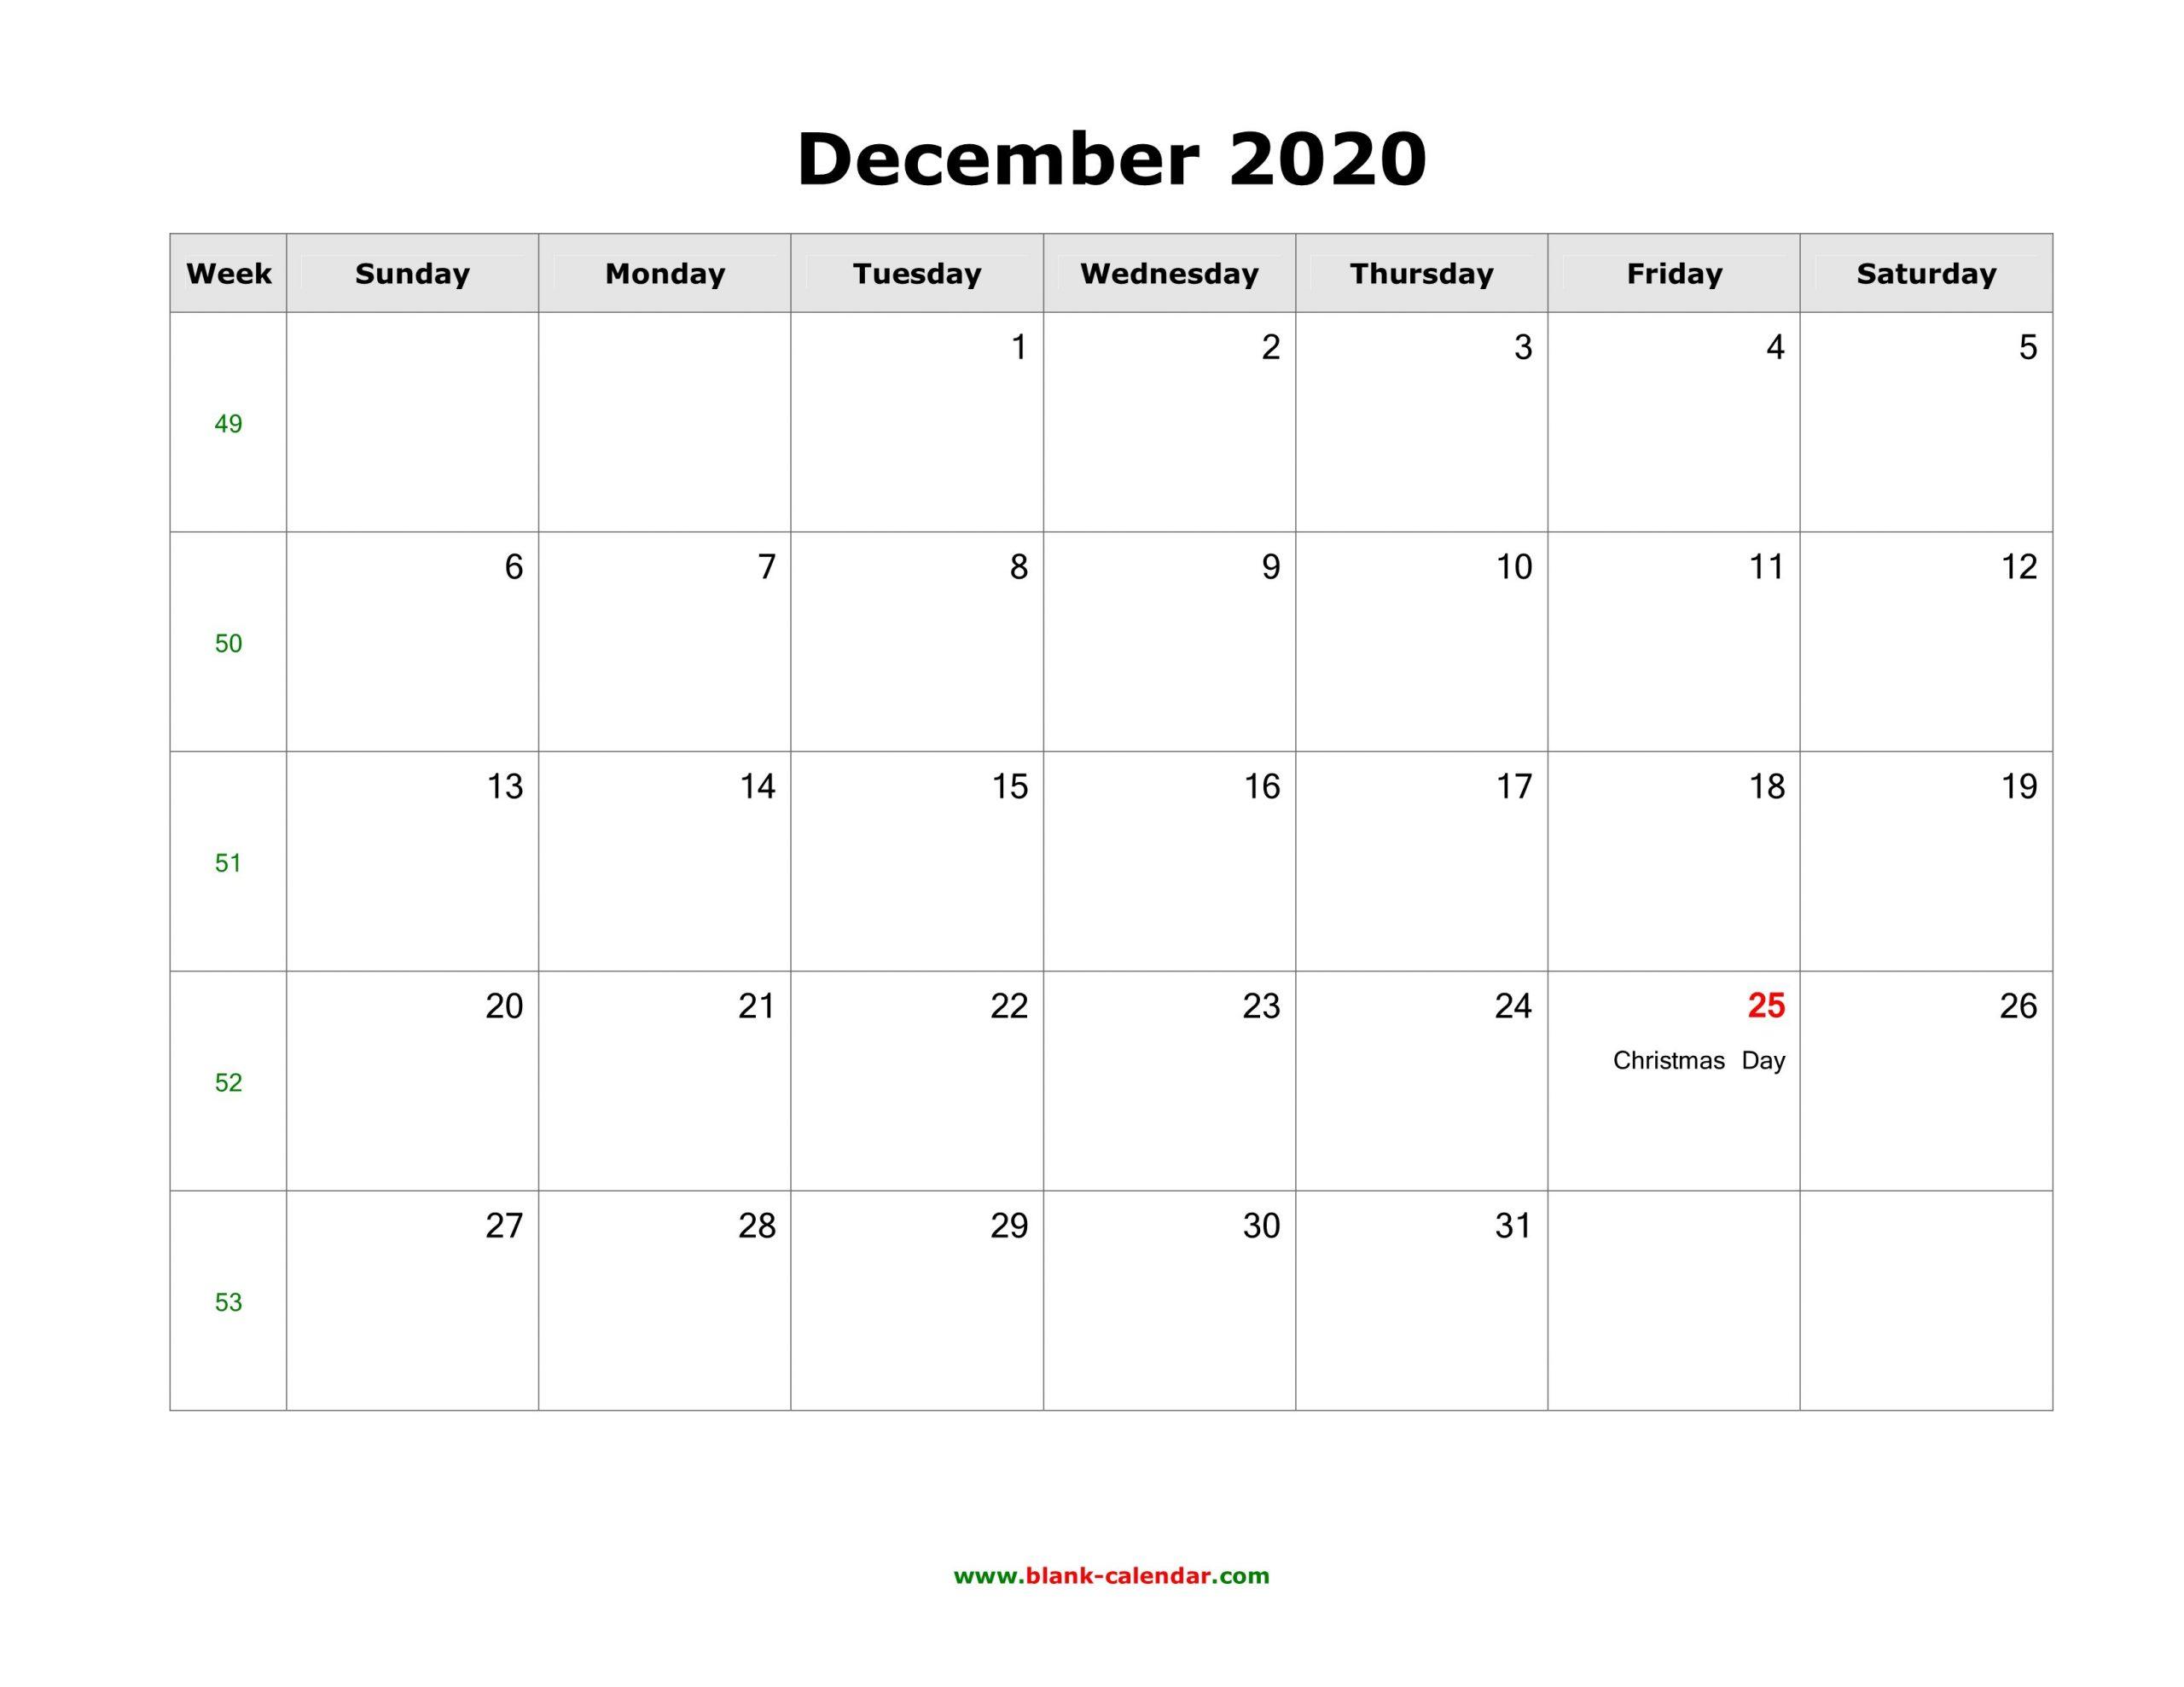 December 2020 Printable Calendar – Free Templates (Pdf, Word) Printable 2020 Calendar Free Saturday To Friday